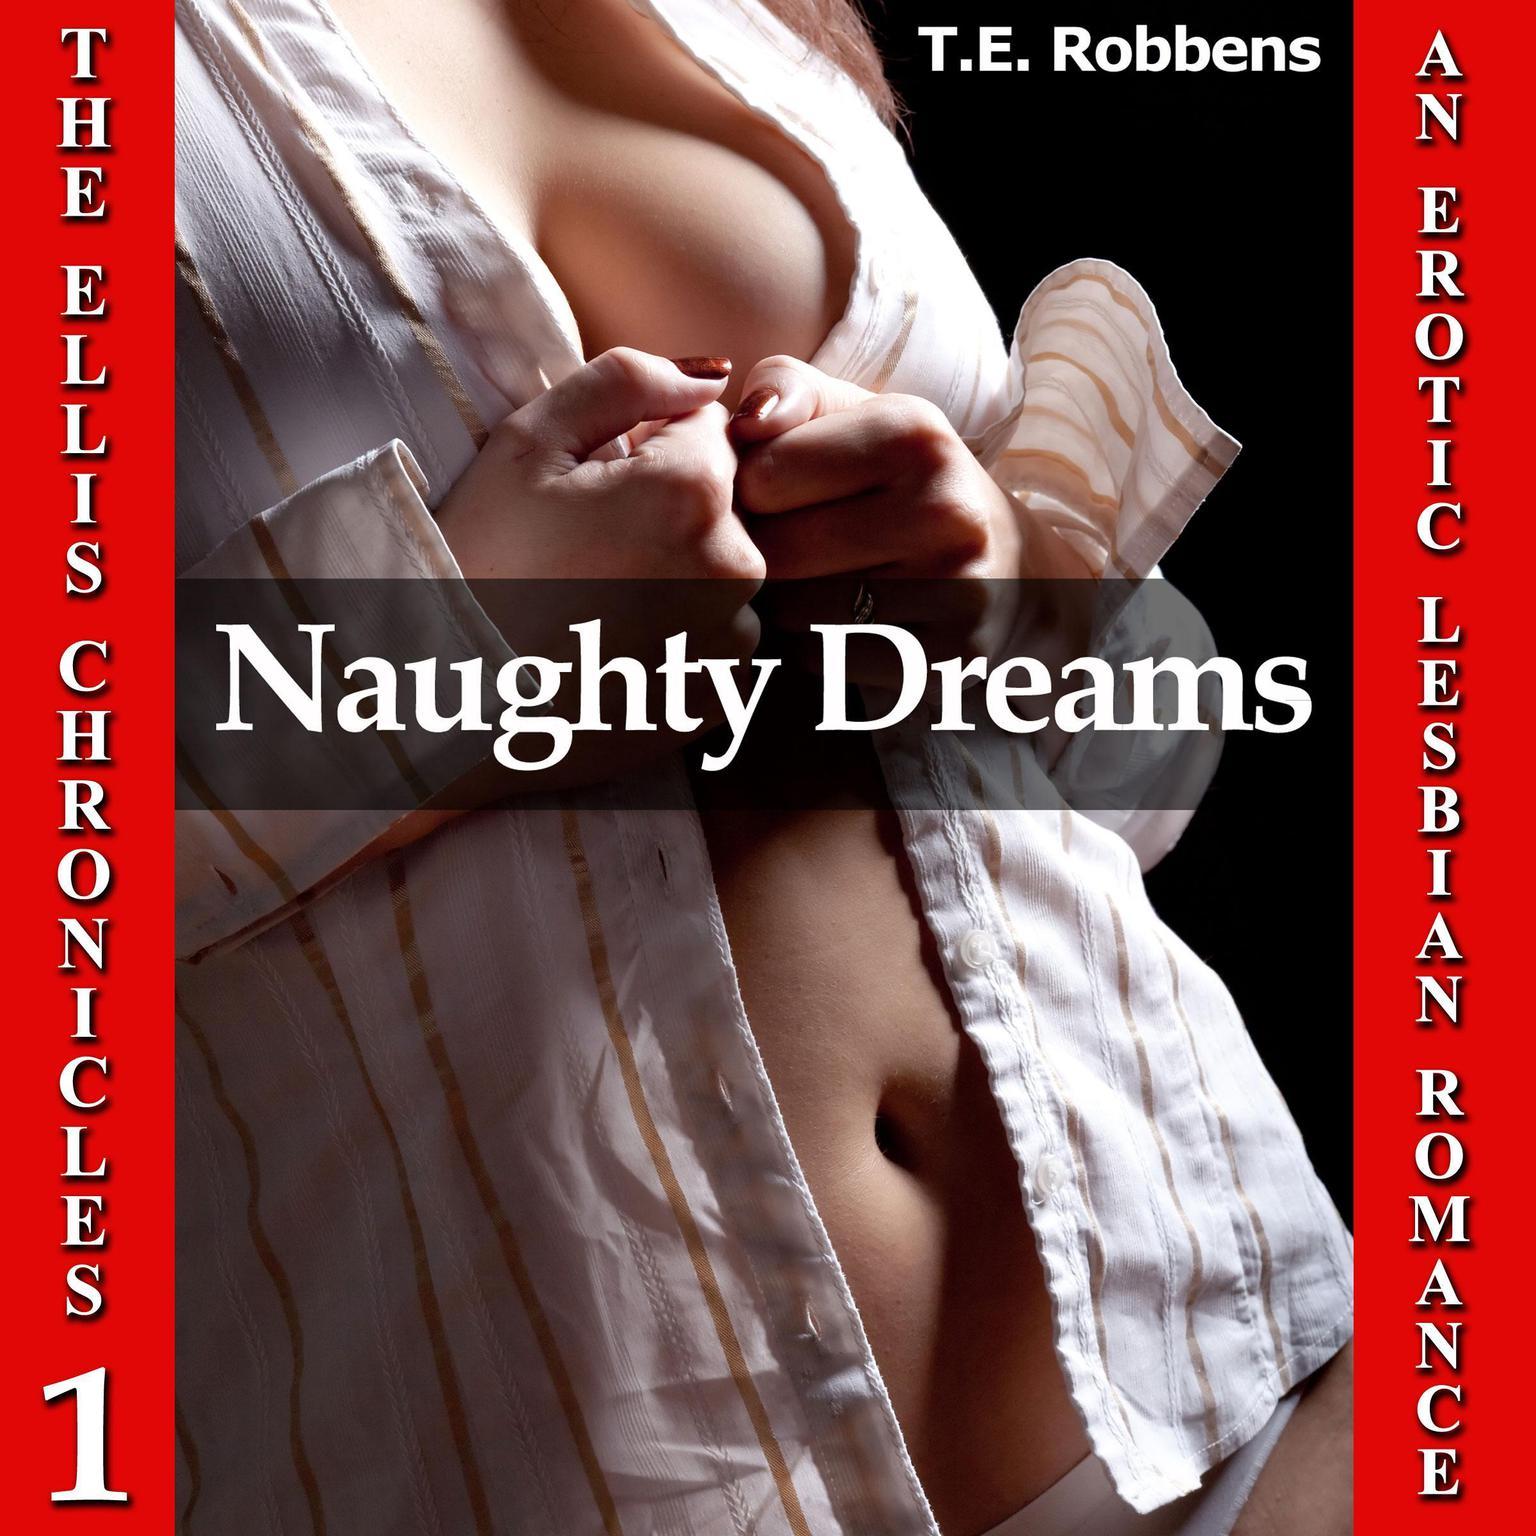 Printable Naughty Dreams: An Erotic Lesbian Romance (The Ellis Chronicles - Book 1) Audiobook Cover Art